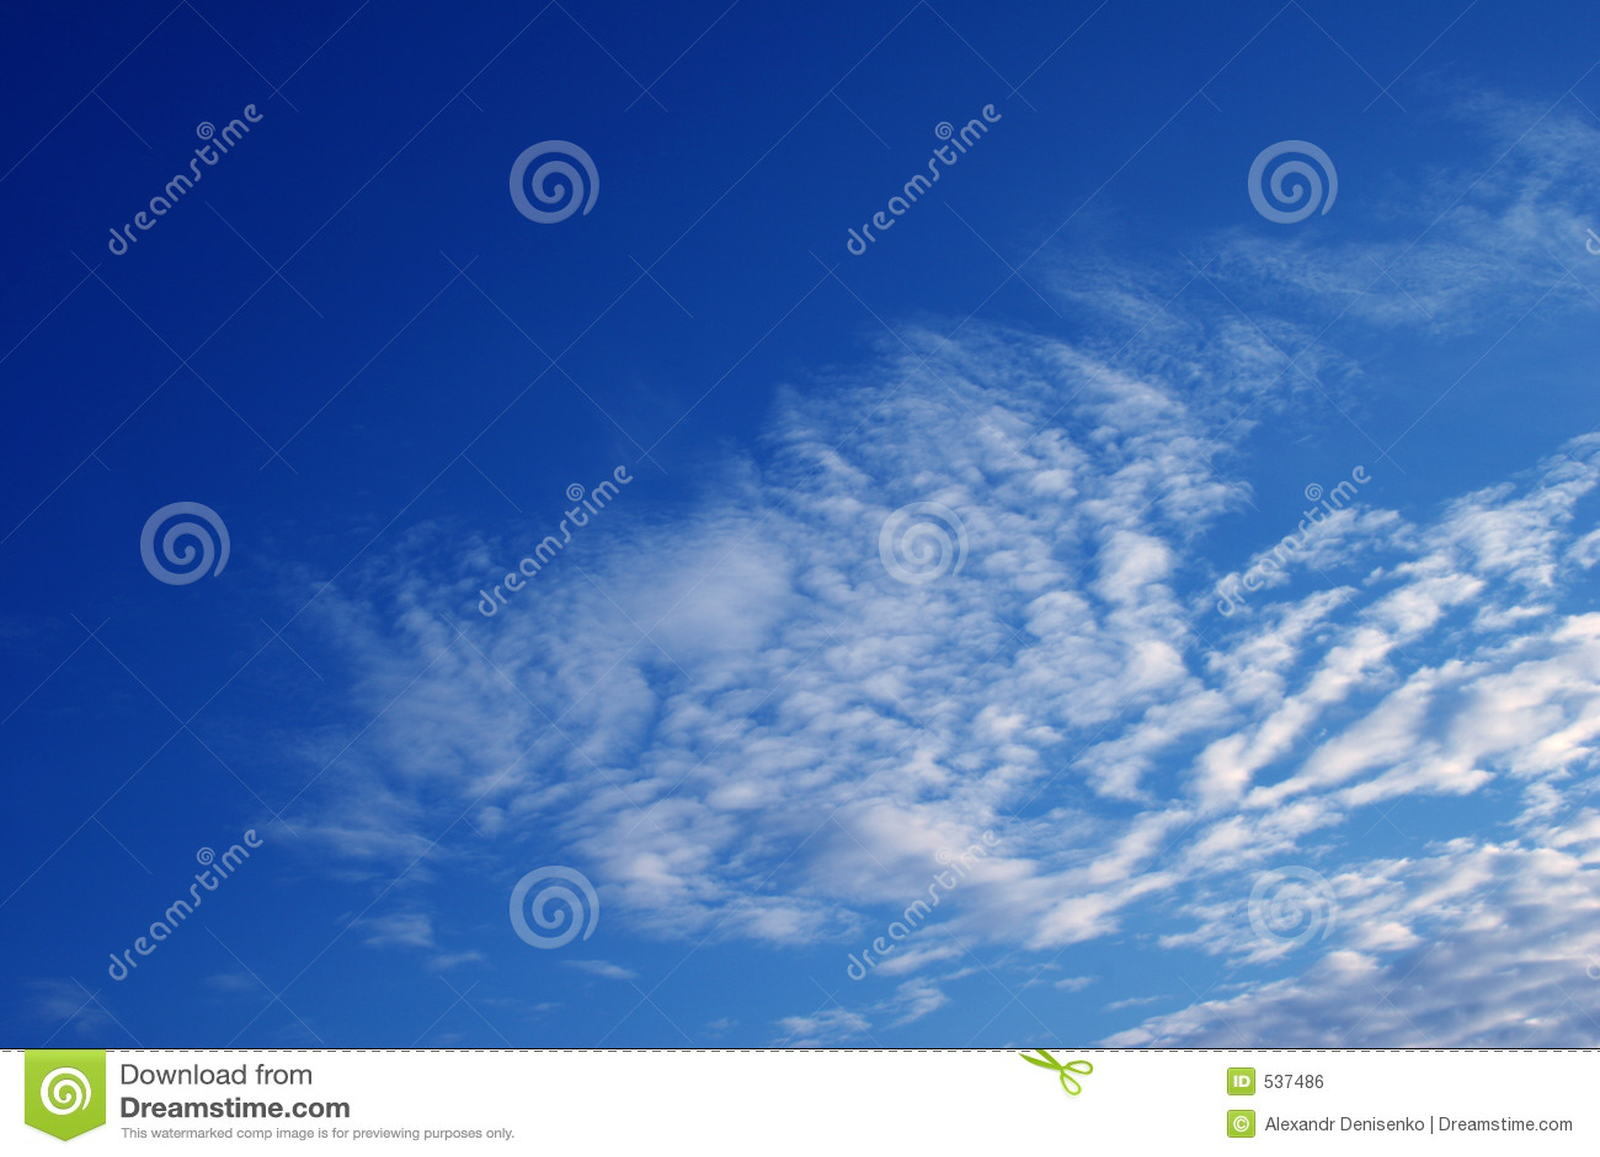 Download 2蓝天 库存照片. 图片 包括有 蓝色, 虚拟, 天空, 柔软光滑, 地图集, 天气, 多云, 模式, 背包 - 537486